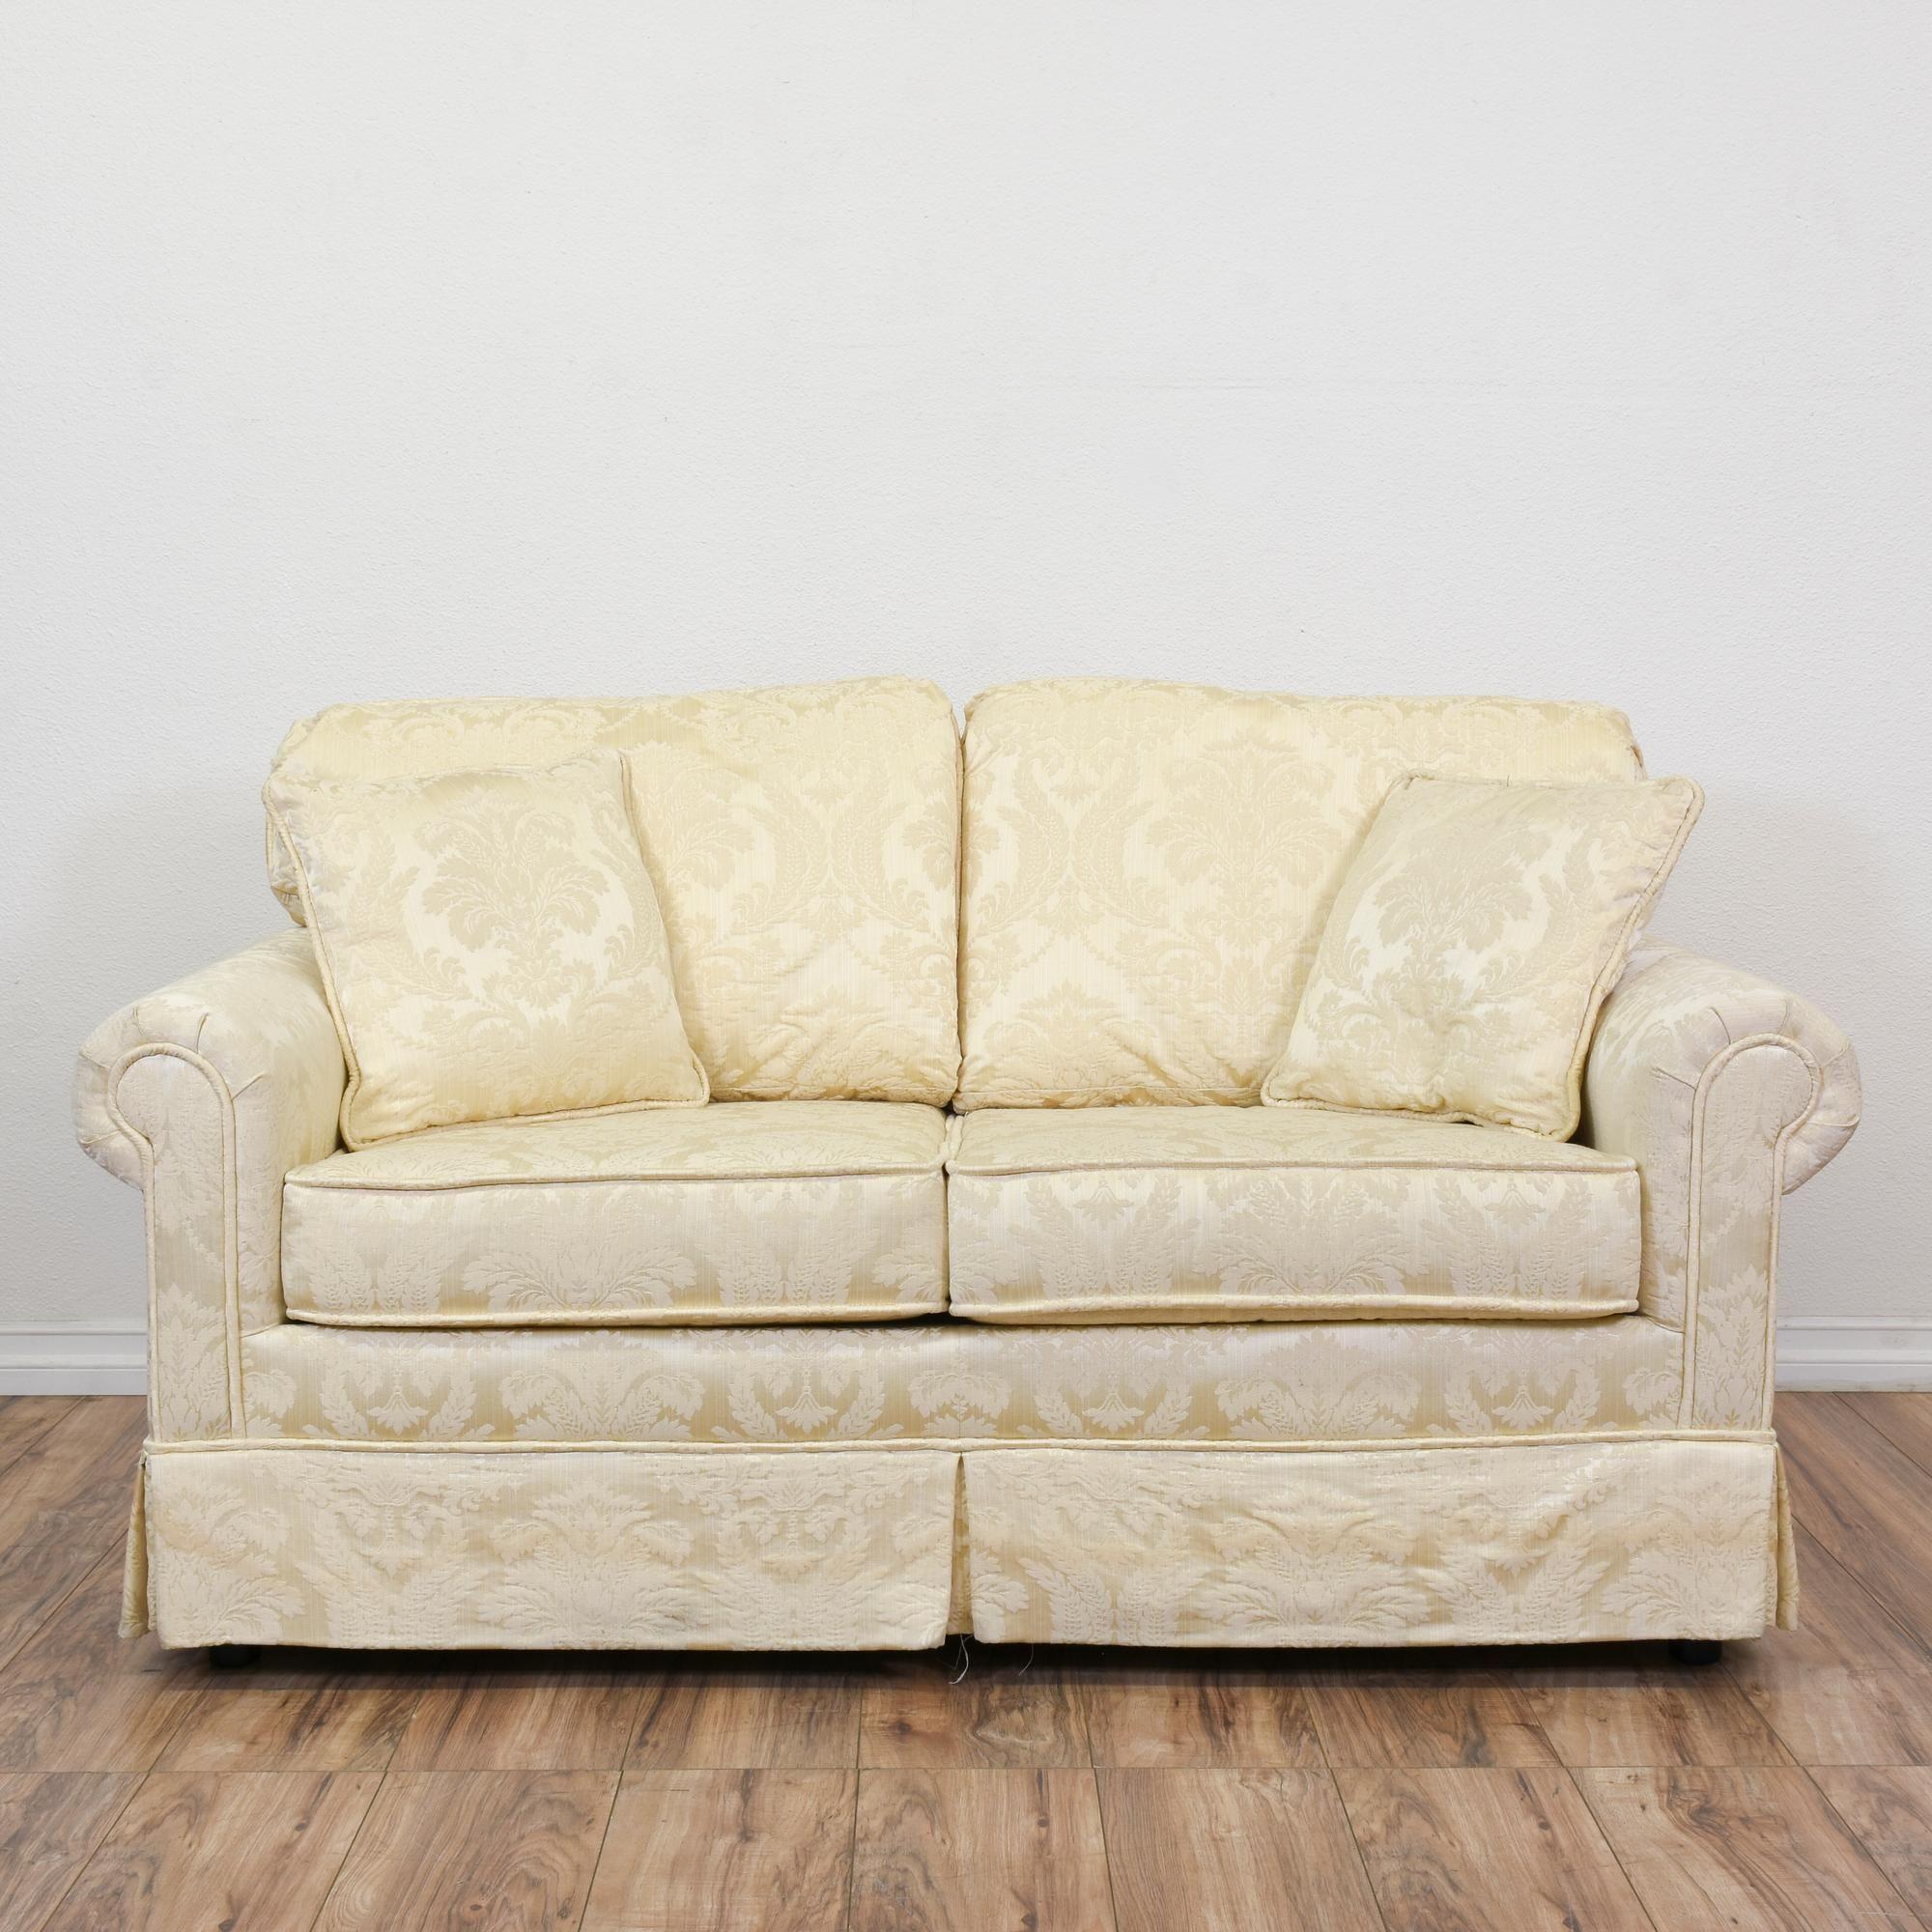 "Krause s"" Cream Floral Damask Loveseat Sofa"